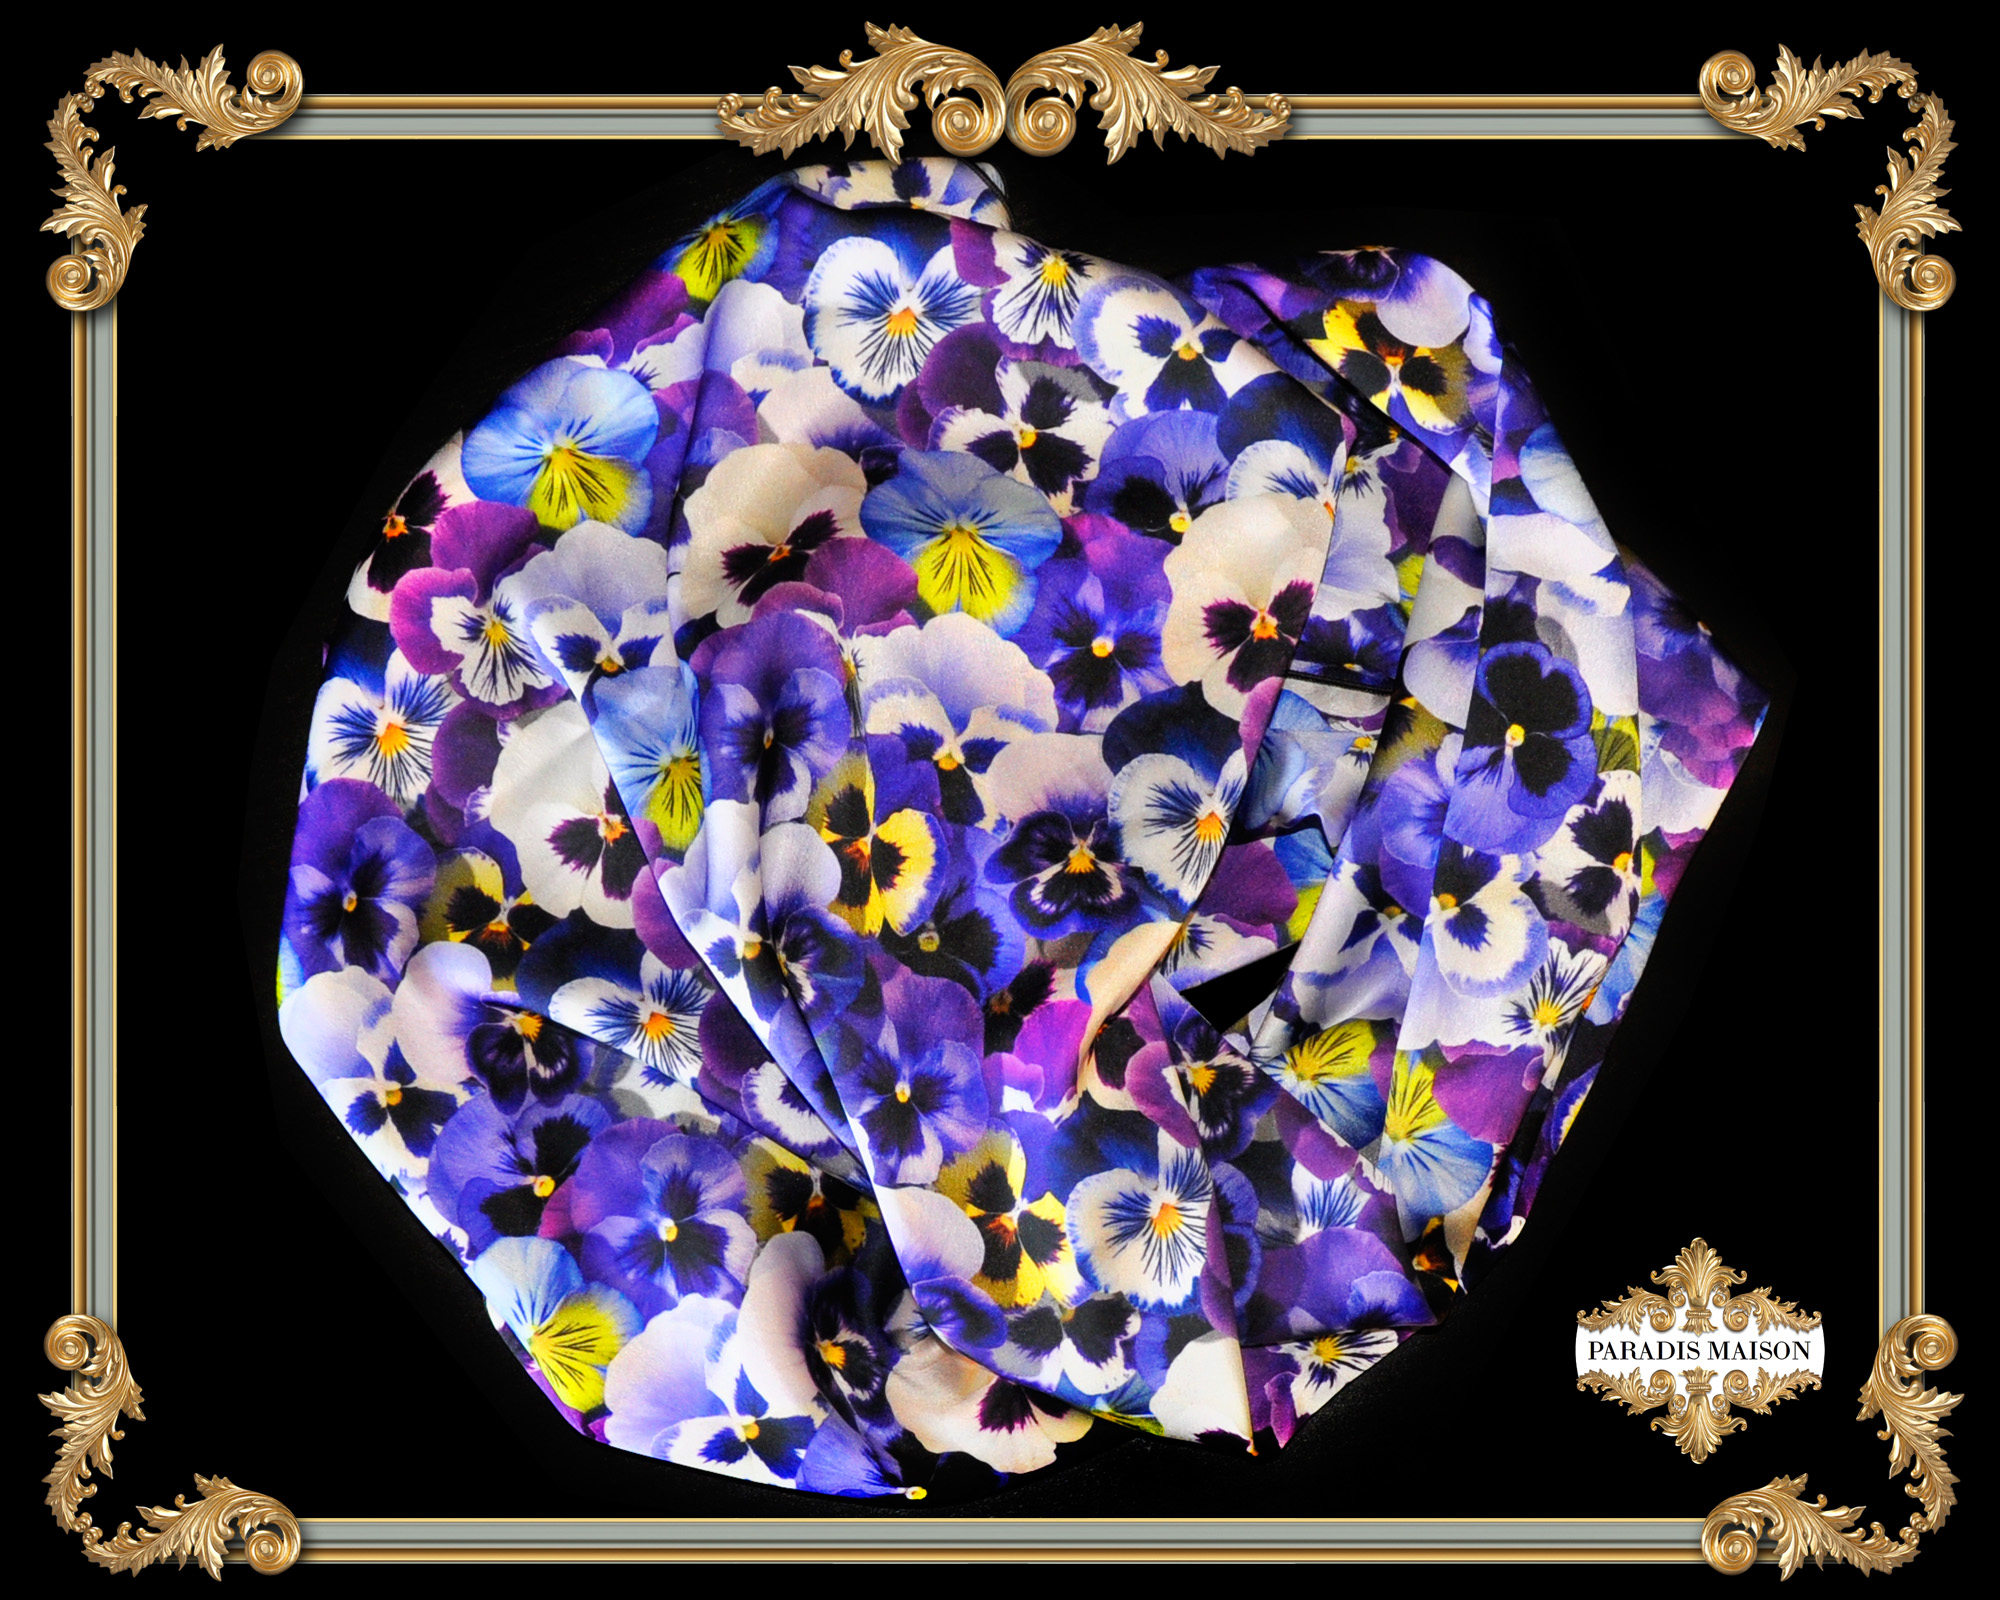 blue pansy flower square silk scarf PARADIS MAISON